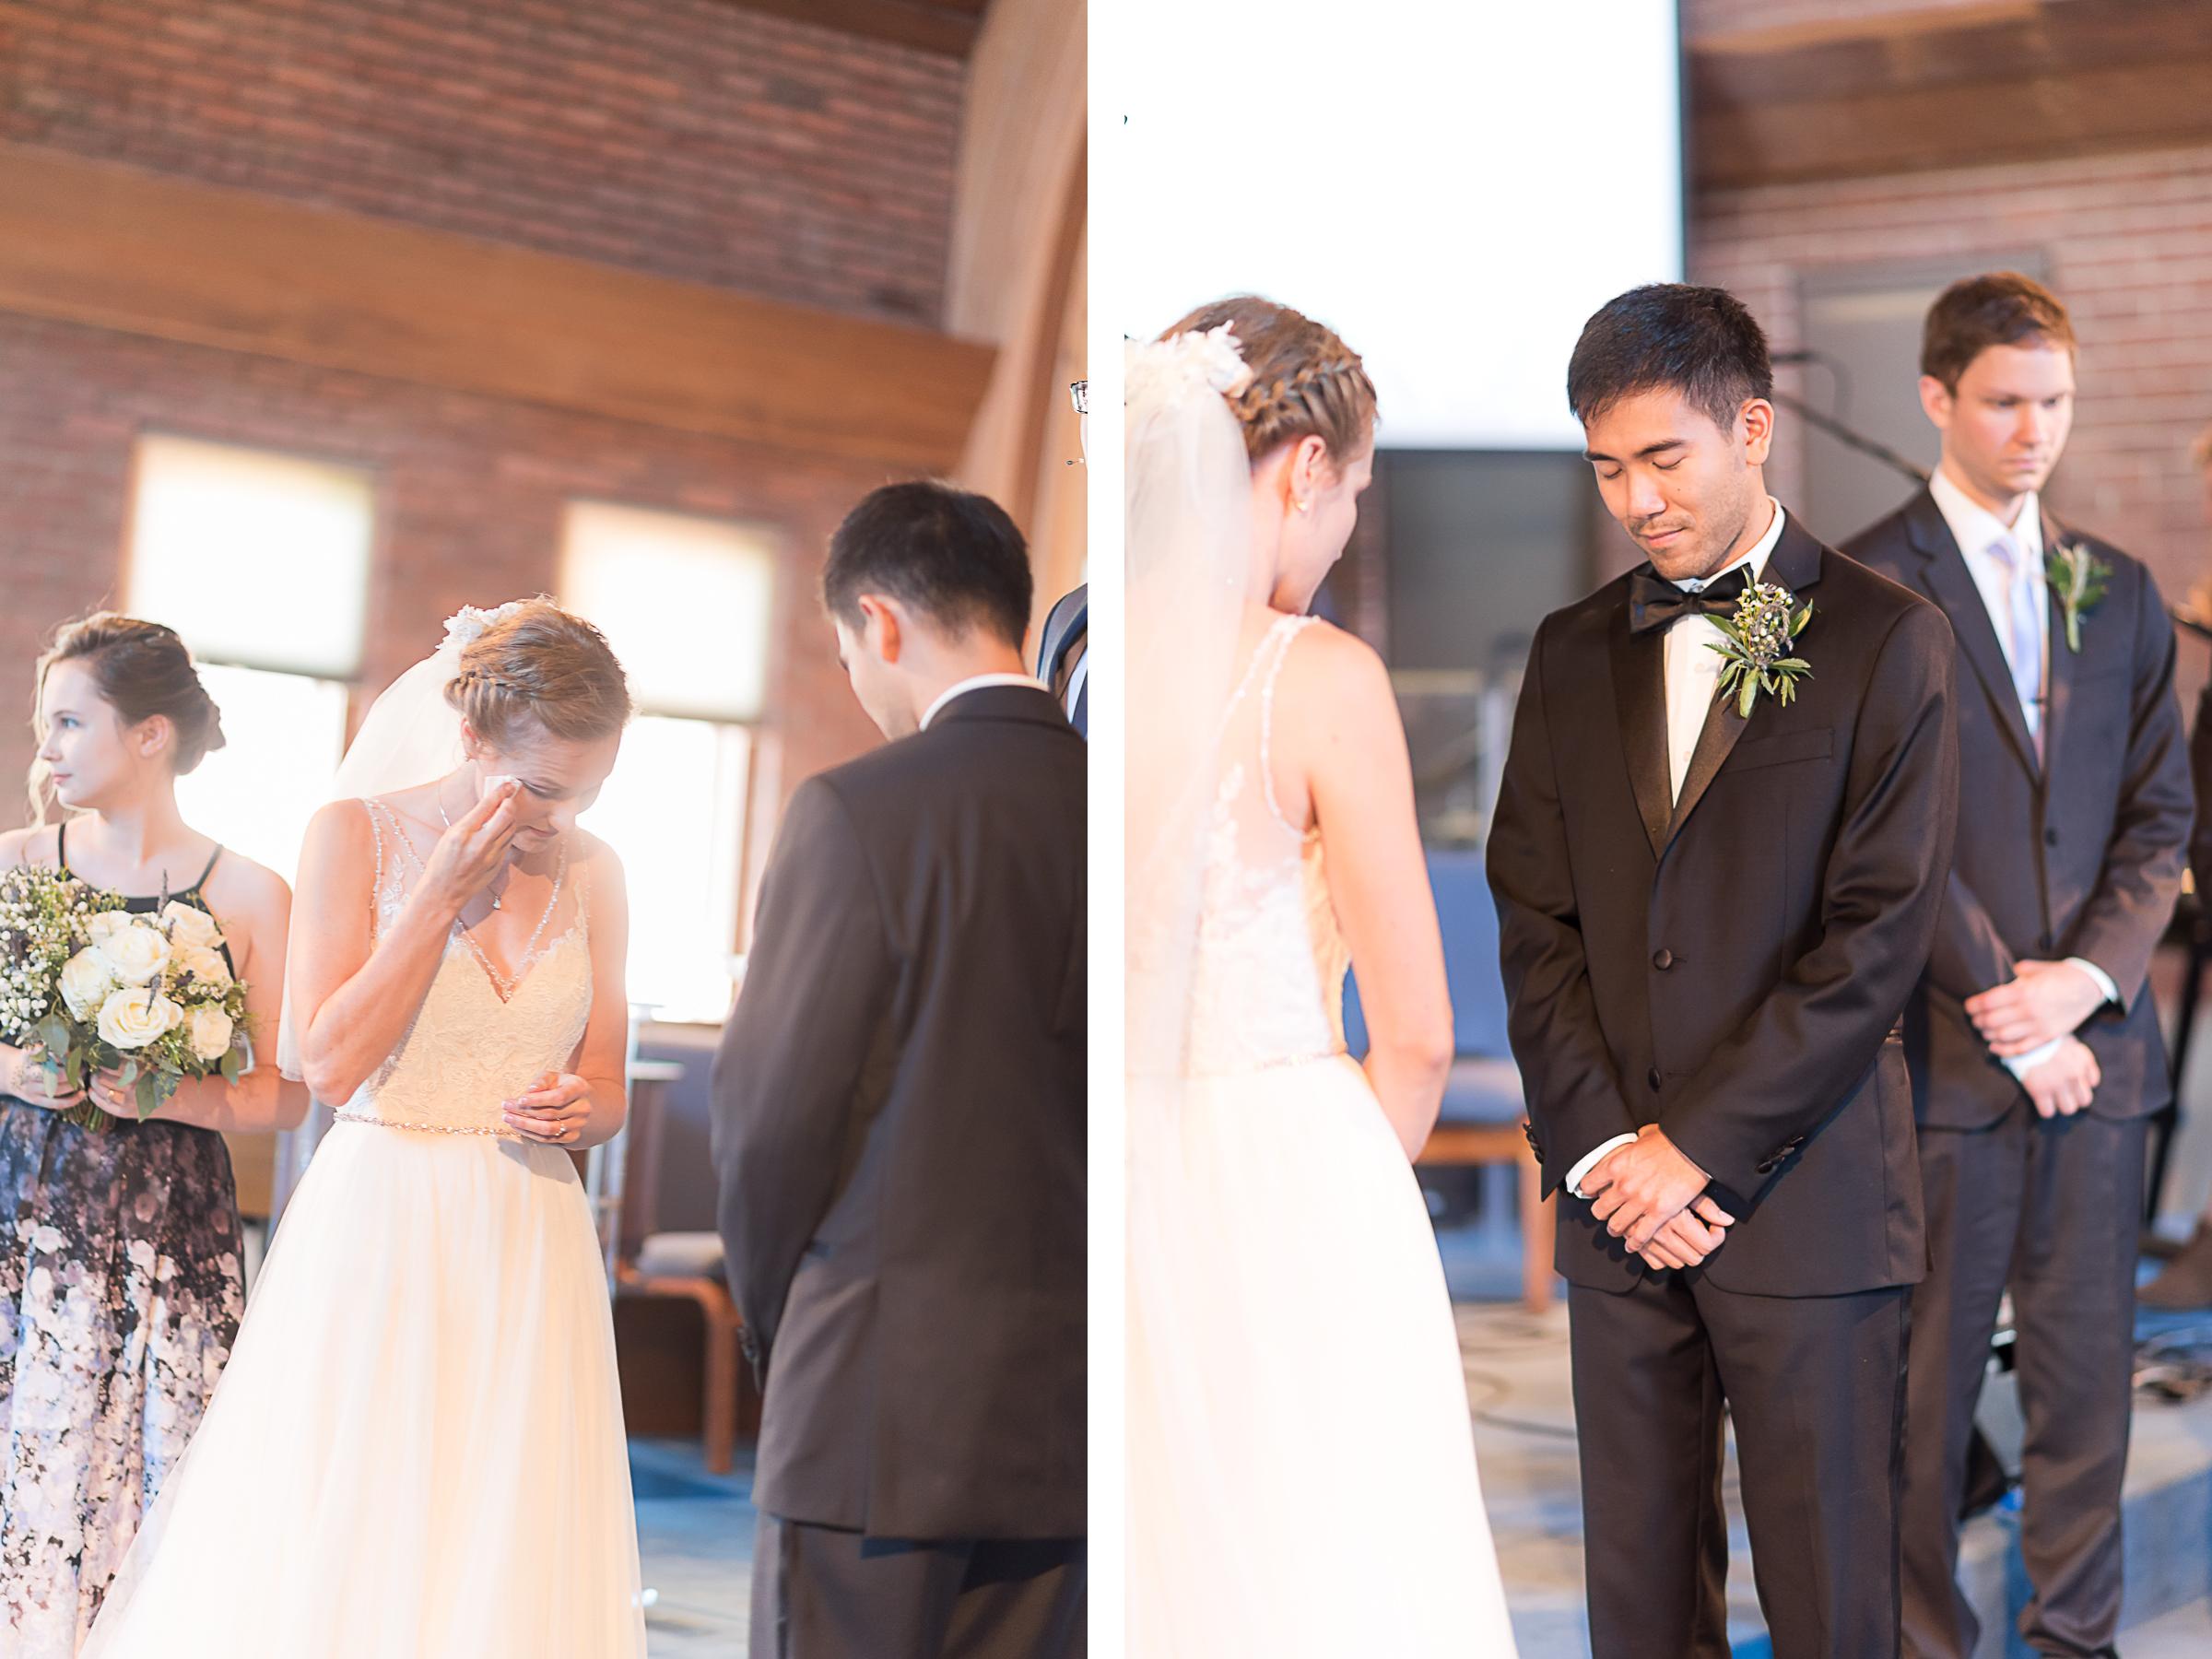 Elkridge-Furnace-Inn-Wedding-Ceremony-Bride-Groom-Crying